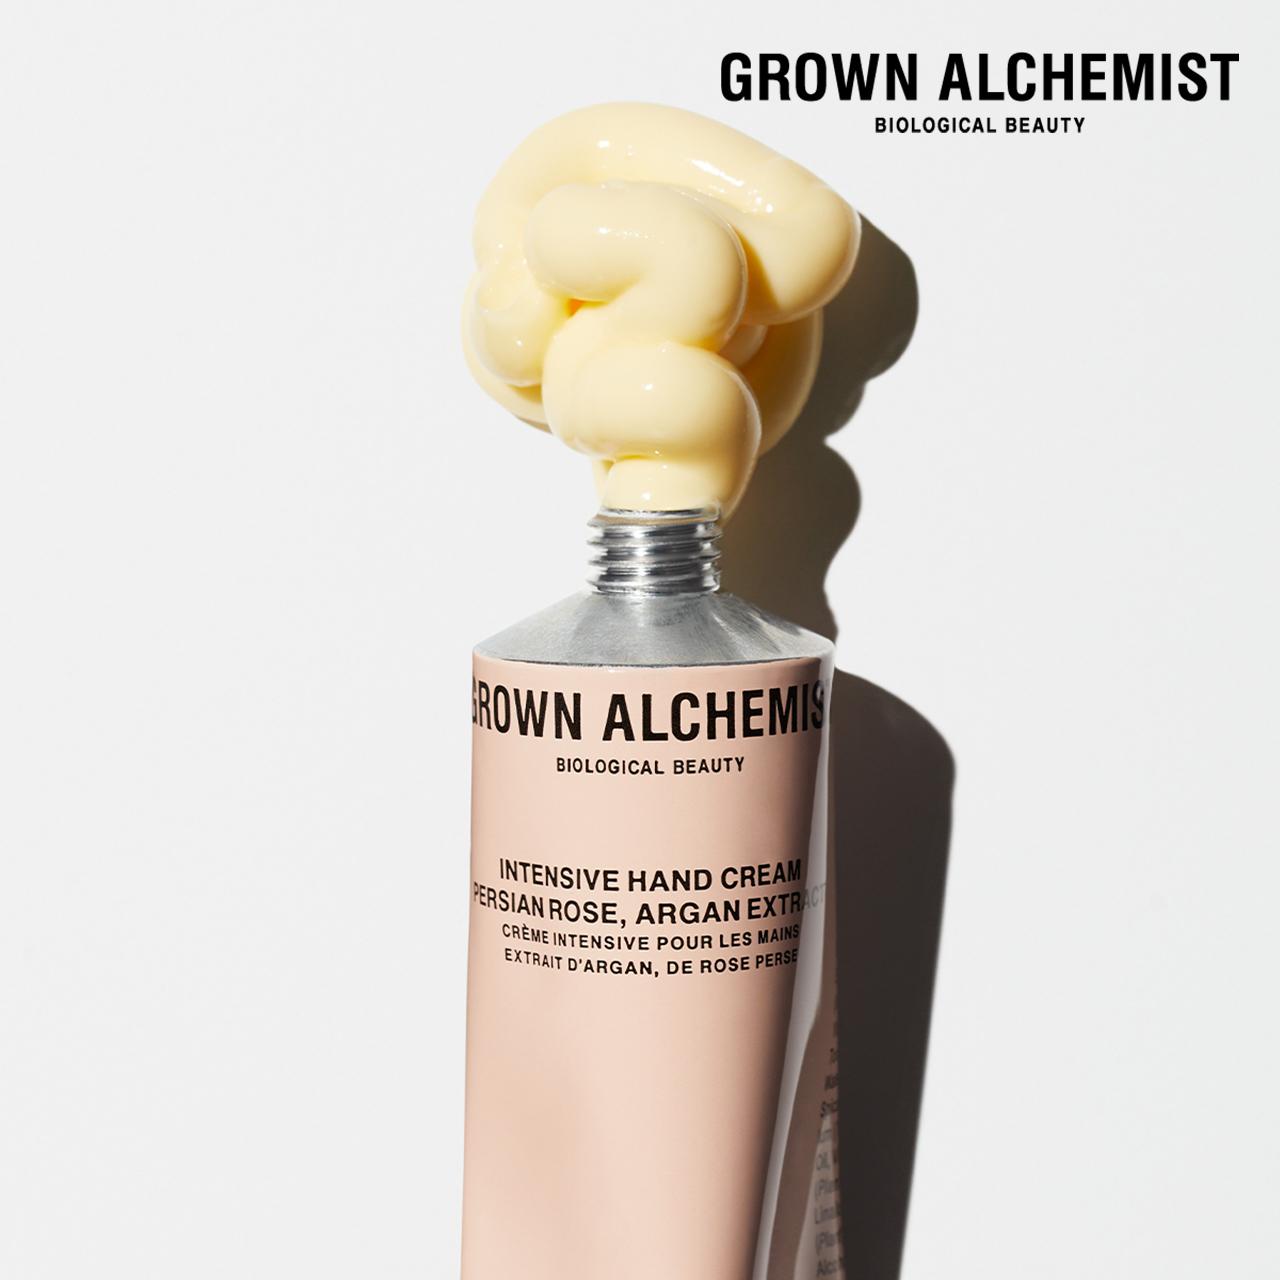 GROWN ALCHEMIST,生活選物,生活雜貨,澳洲品牌,澳洲保養品牌,保養品牌